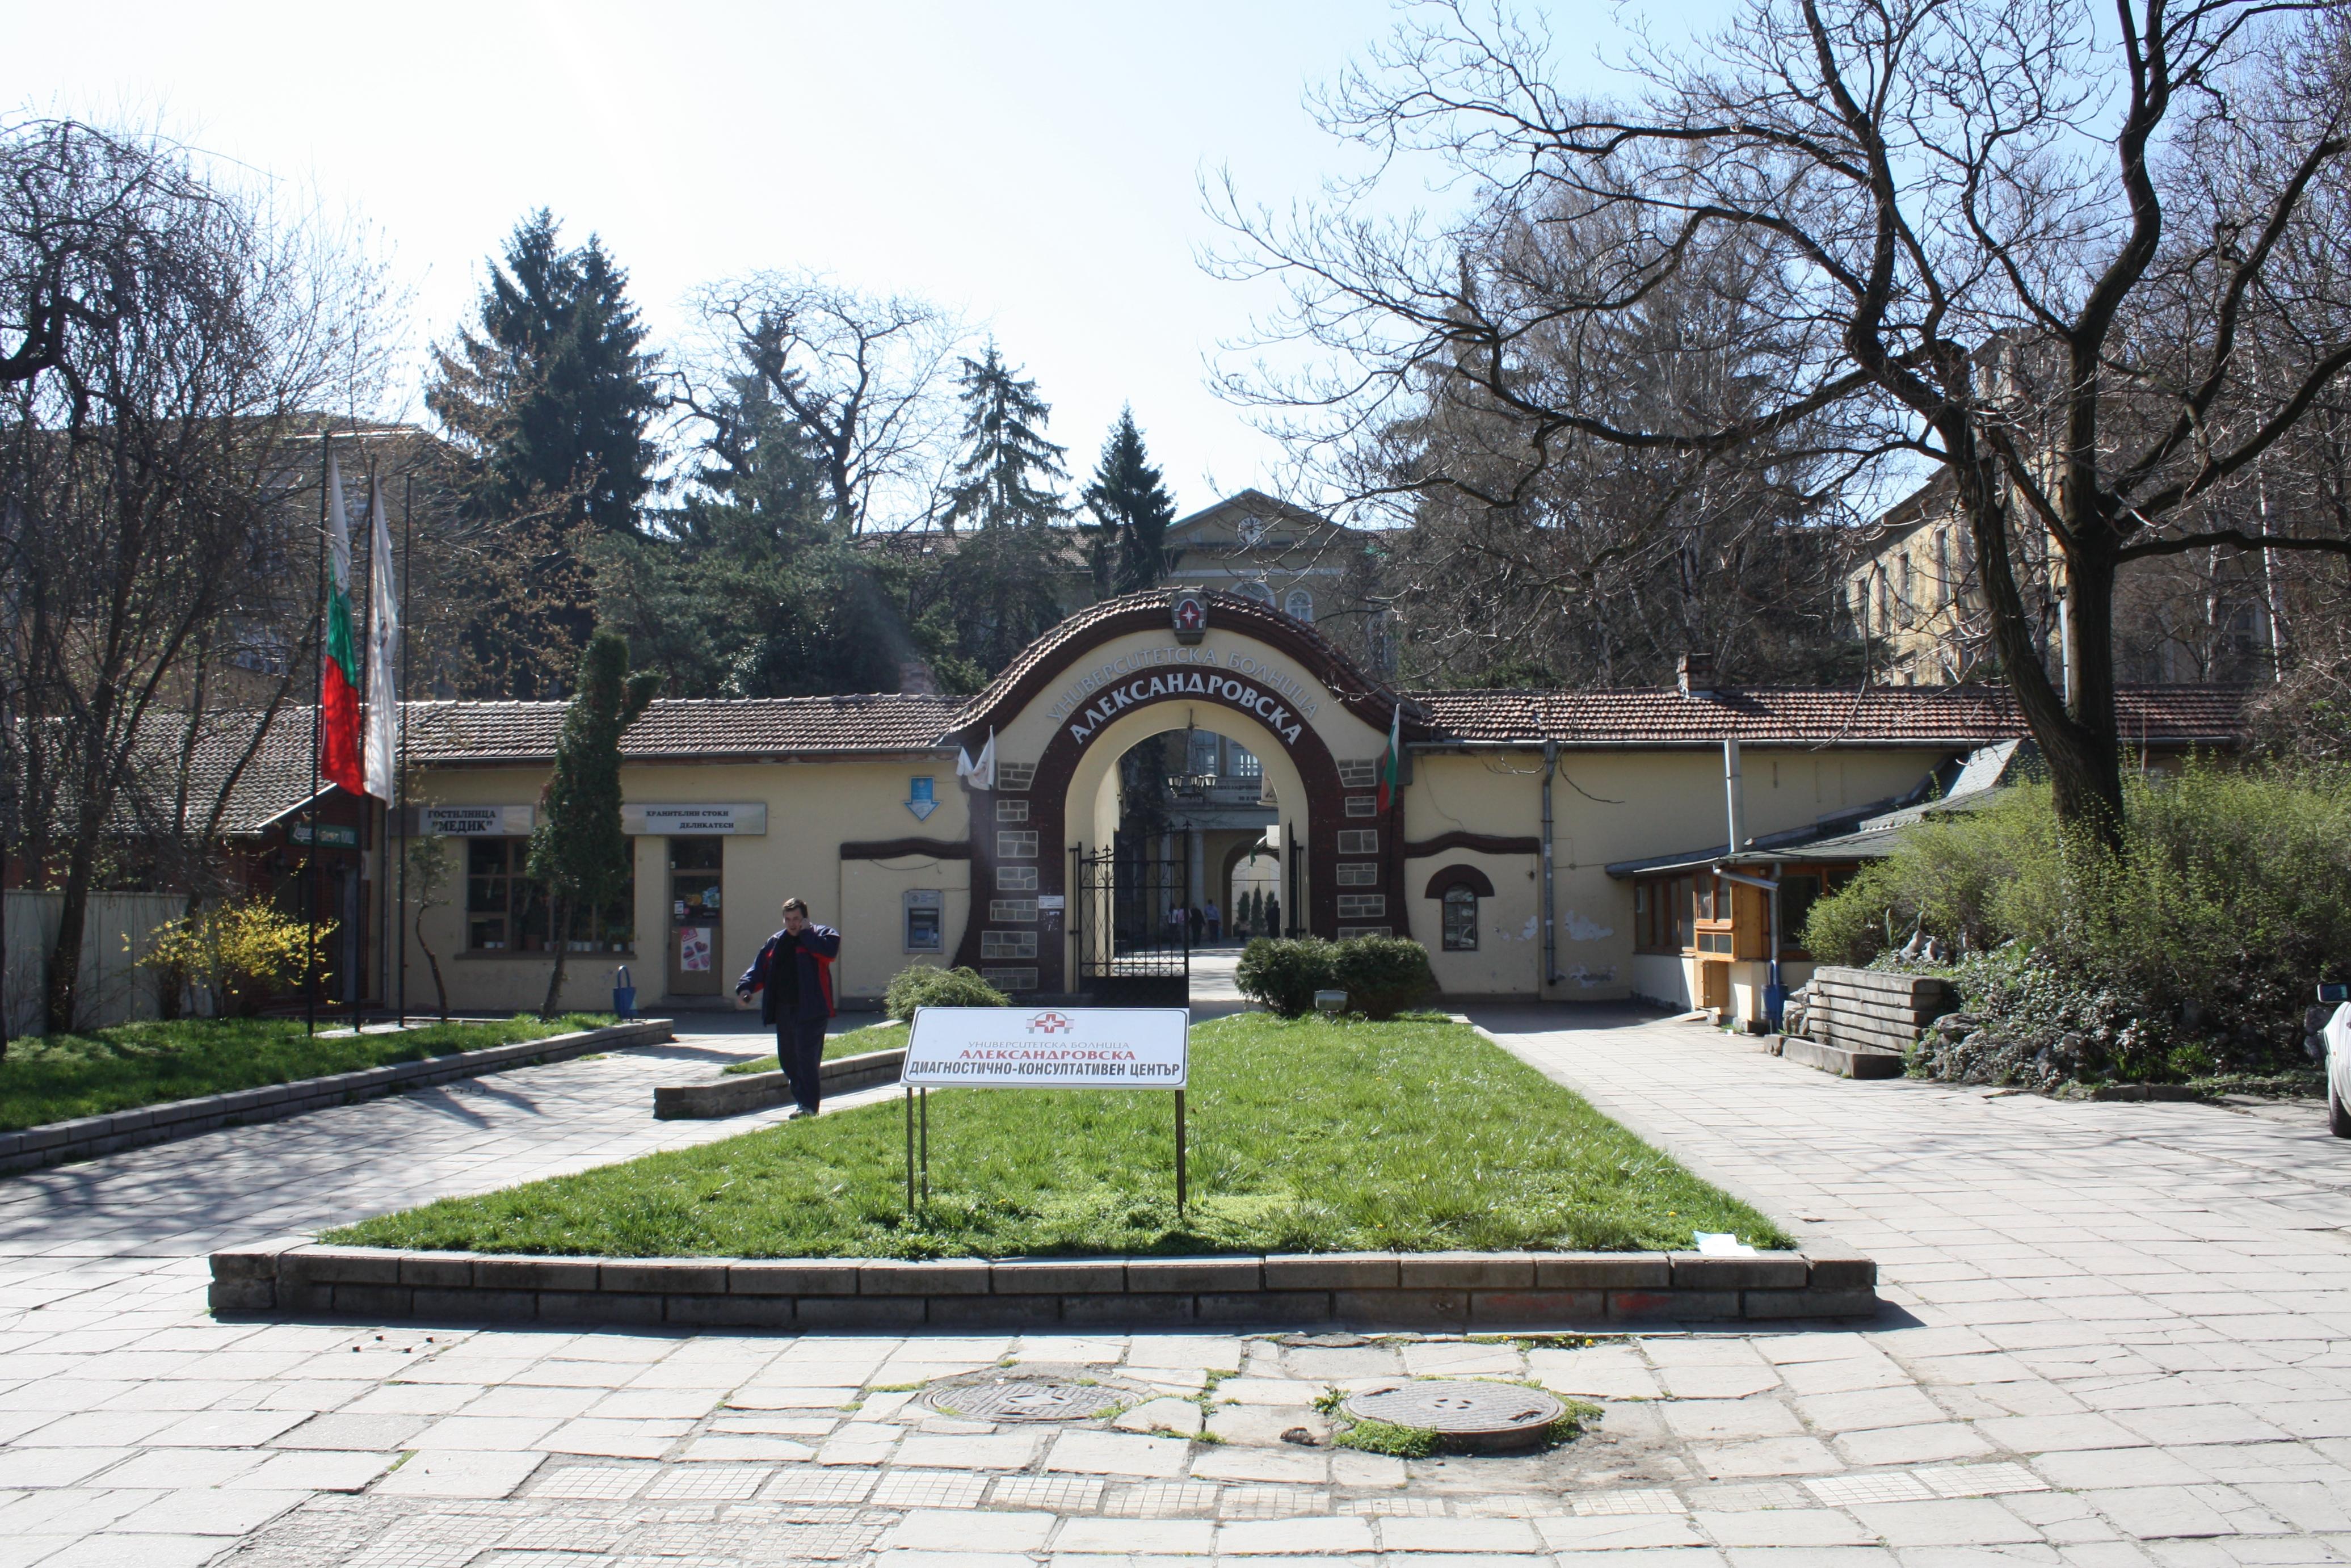 Medicina a sofia - Agenzia immobiliare sofia bulgaria ...